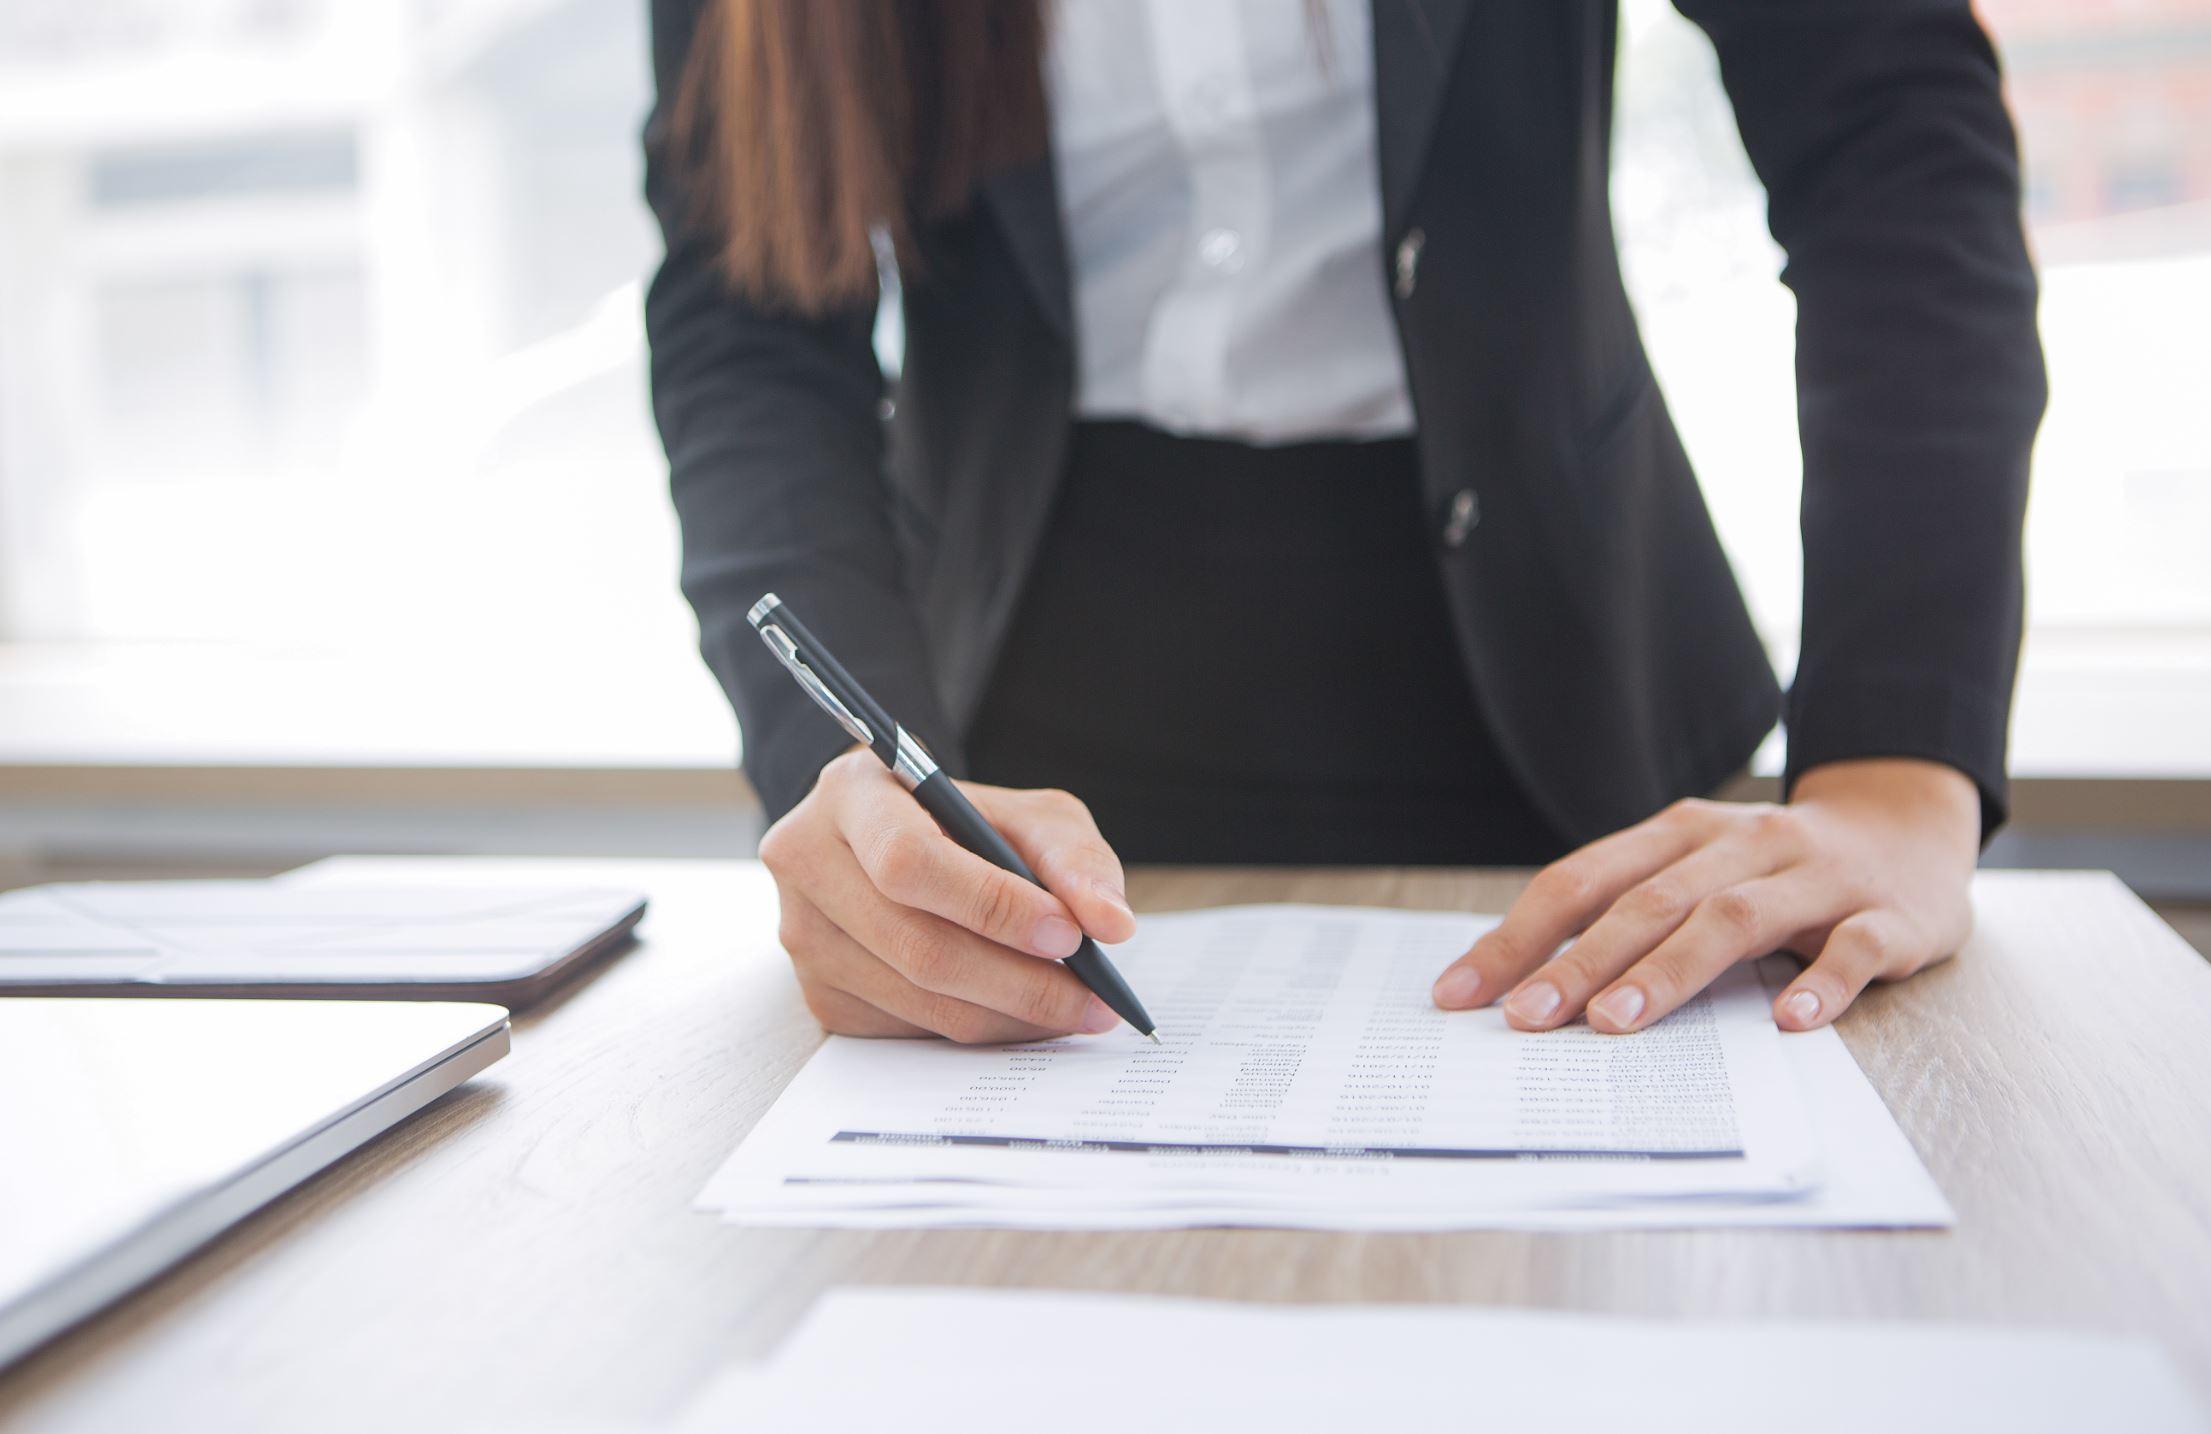 Como Administrar una Empresa – 4 Pilares Básicos